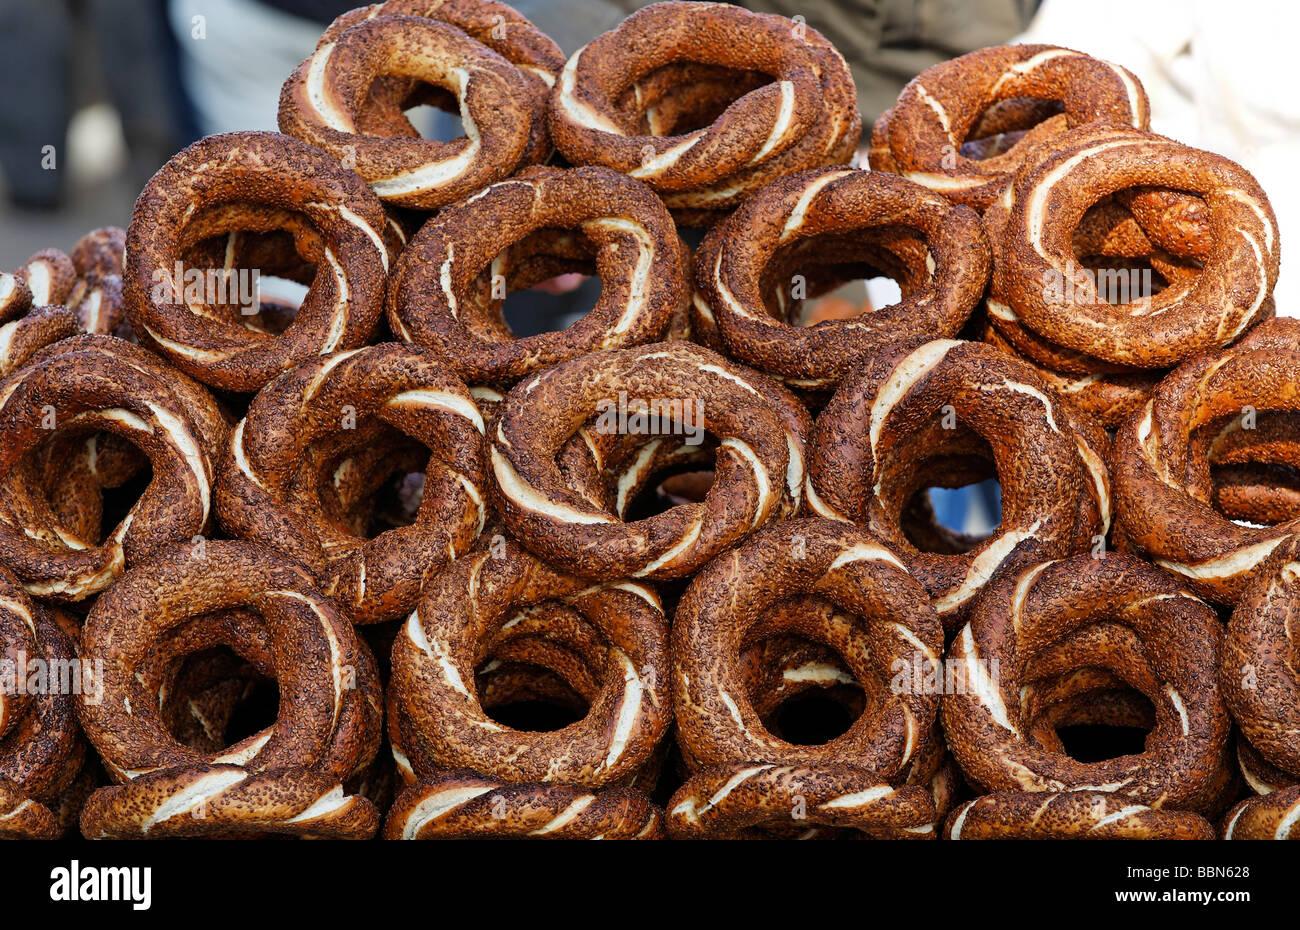 Stacked sesame bread loops, Simit, of a street vendor, Eminoenue, Istanbul, Turkey - Stock Image